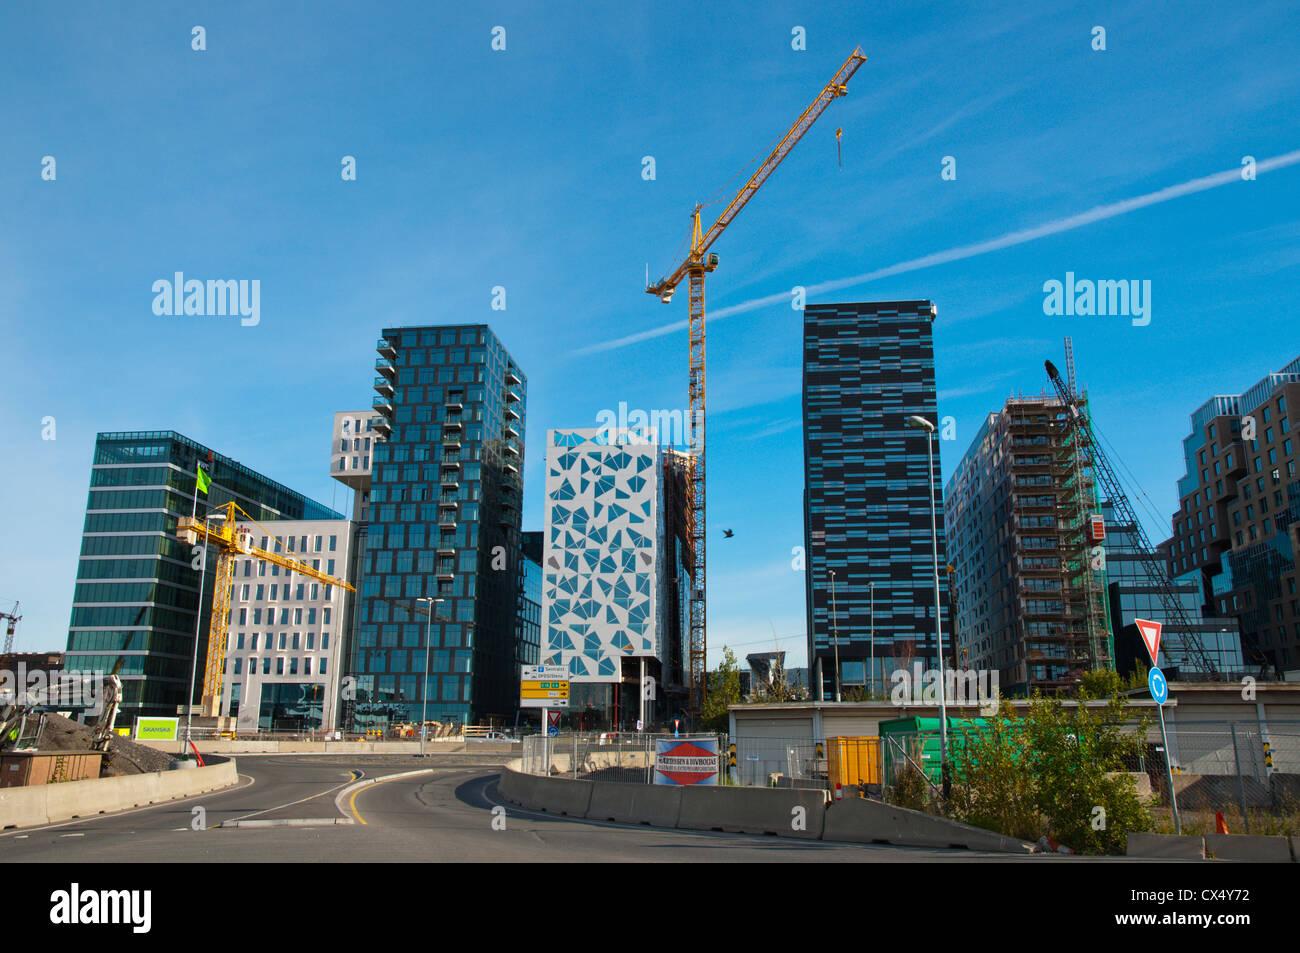 Bjorvika district Fjord City area central Oslo Norway Europe - Stock Image